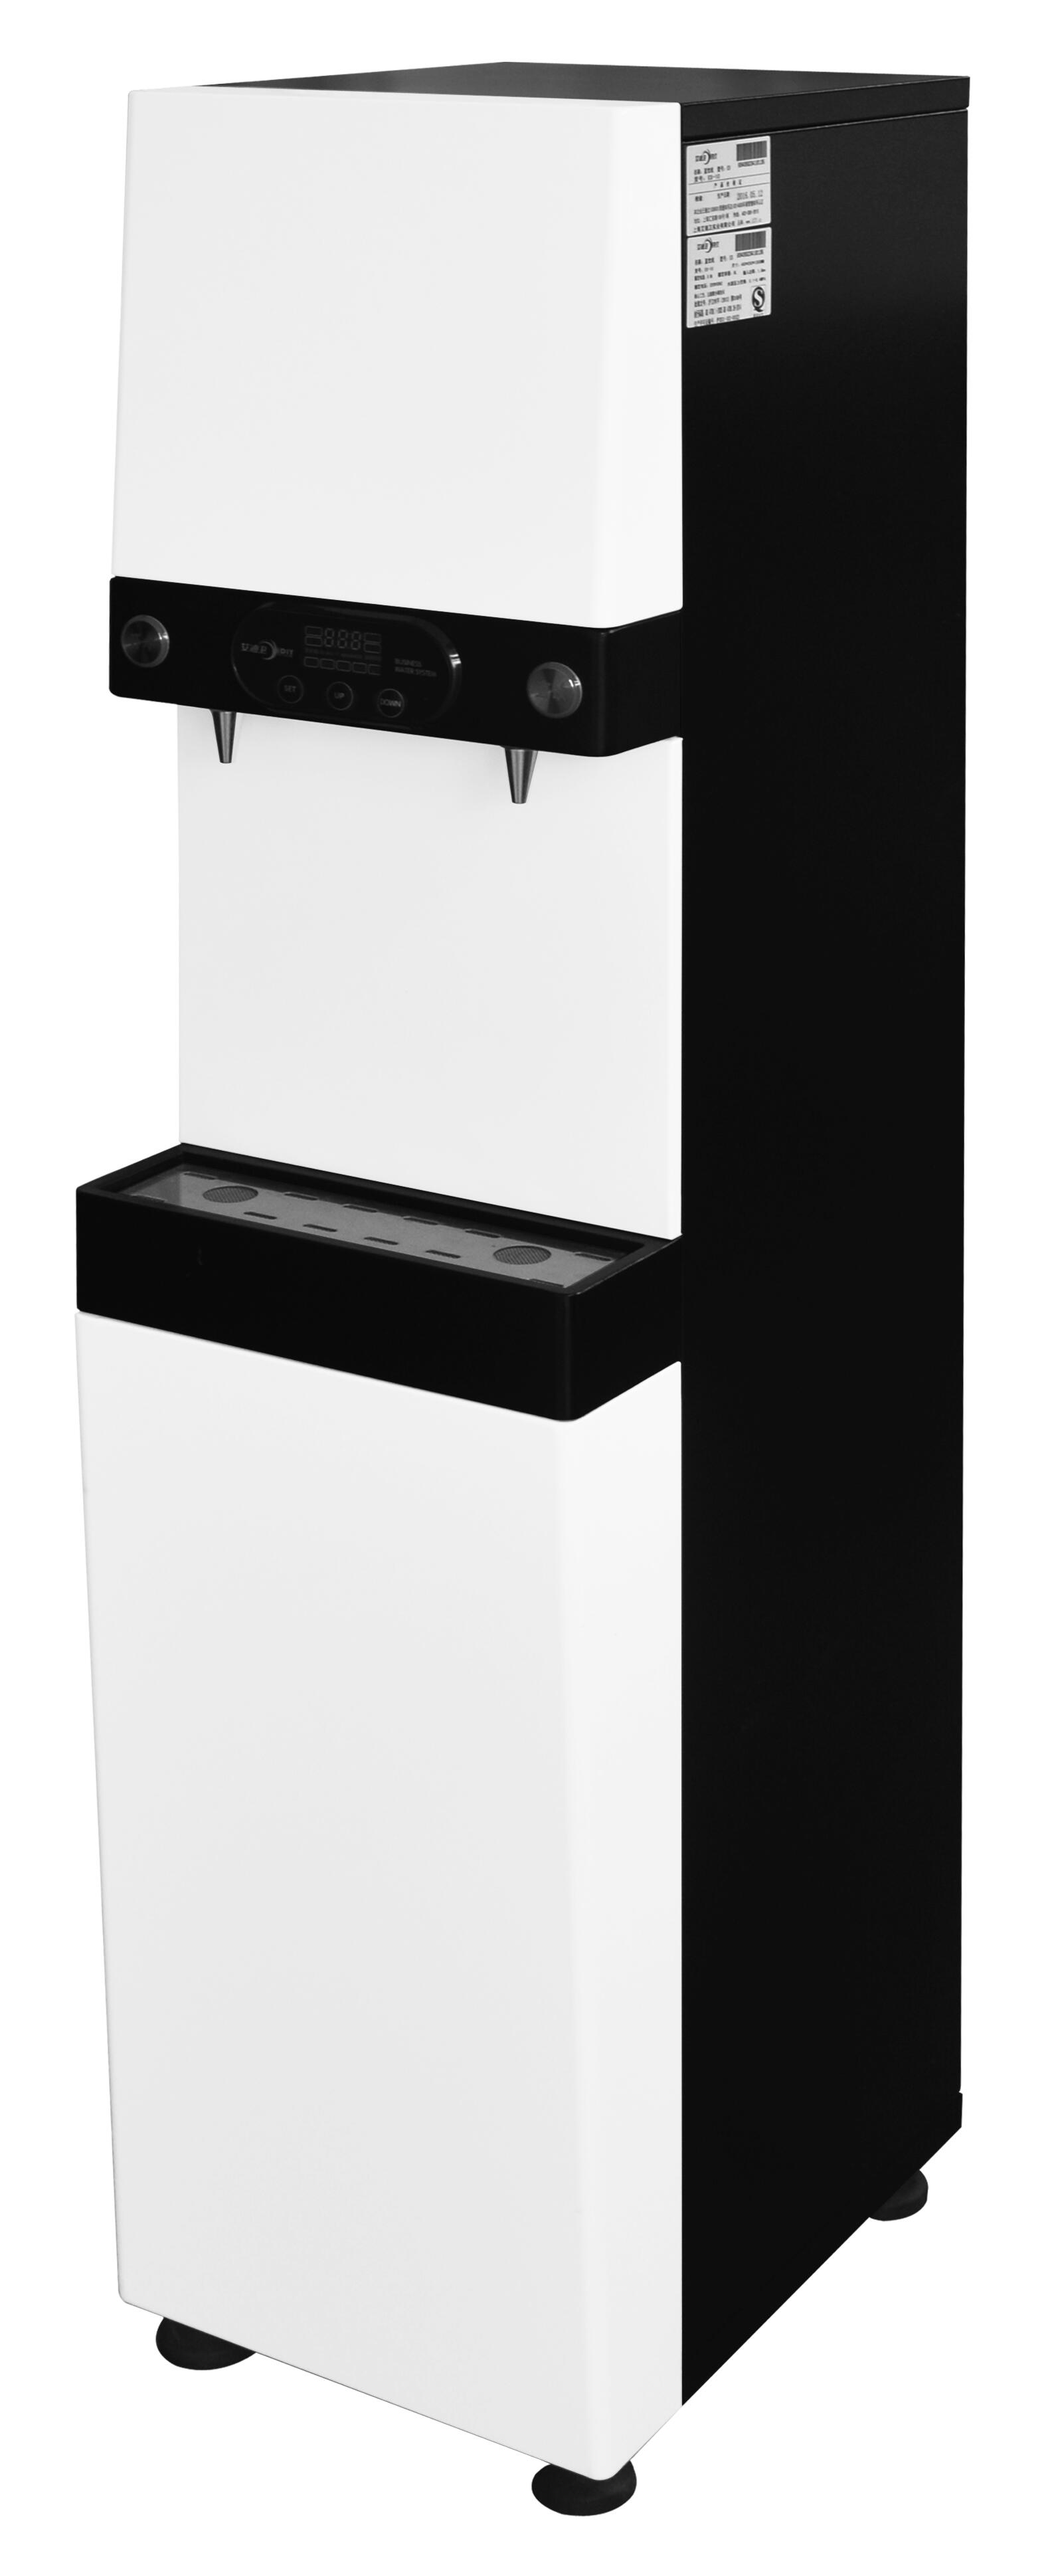 betway必威app_四川betway必威app商务办公室直饮水机黑白搭配可供80人以上用水